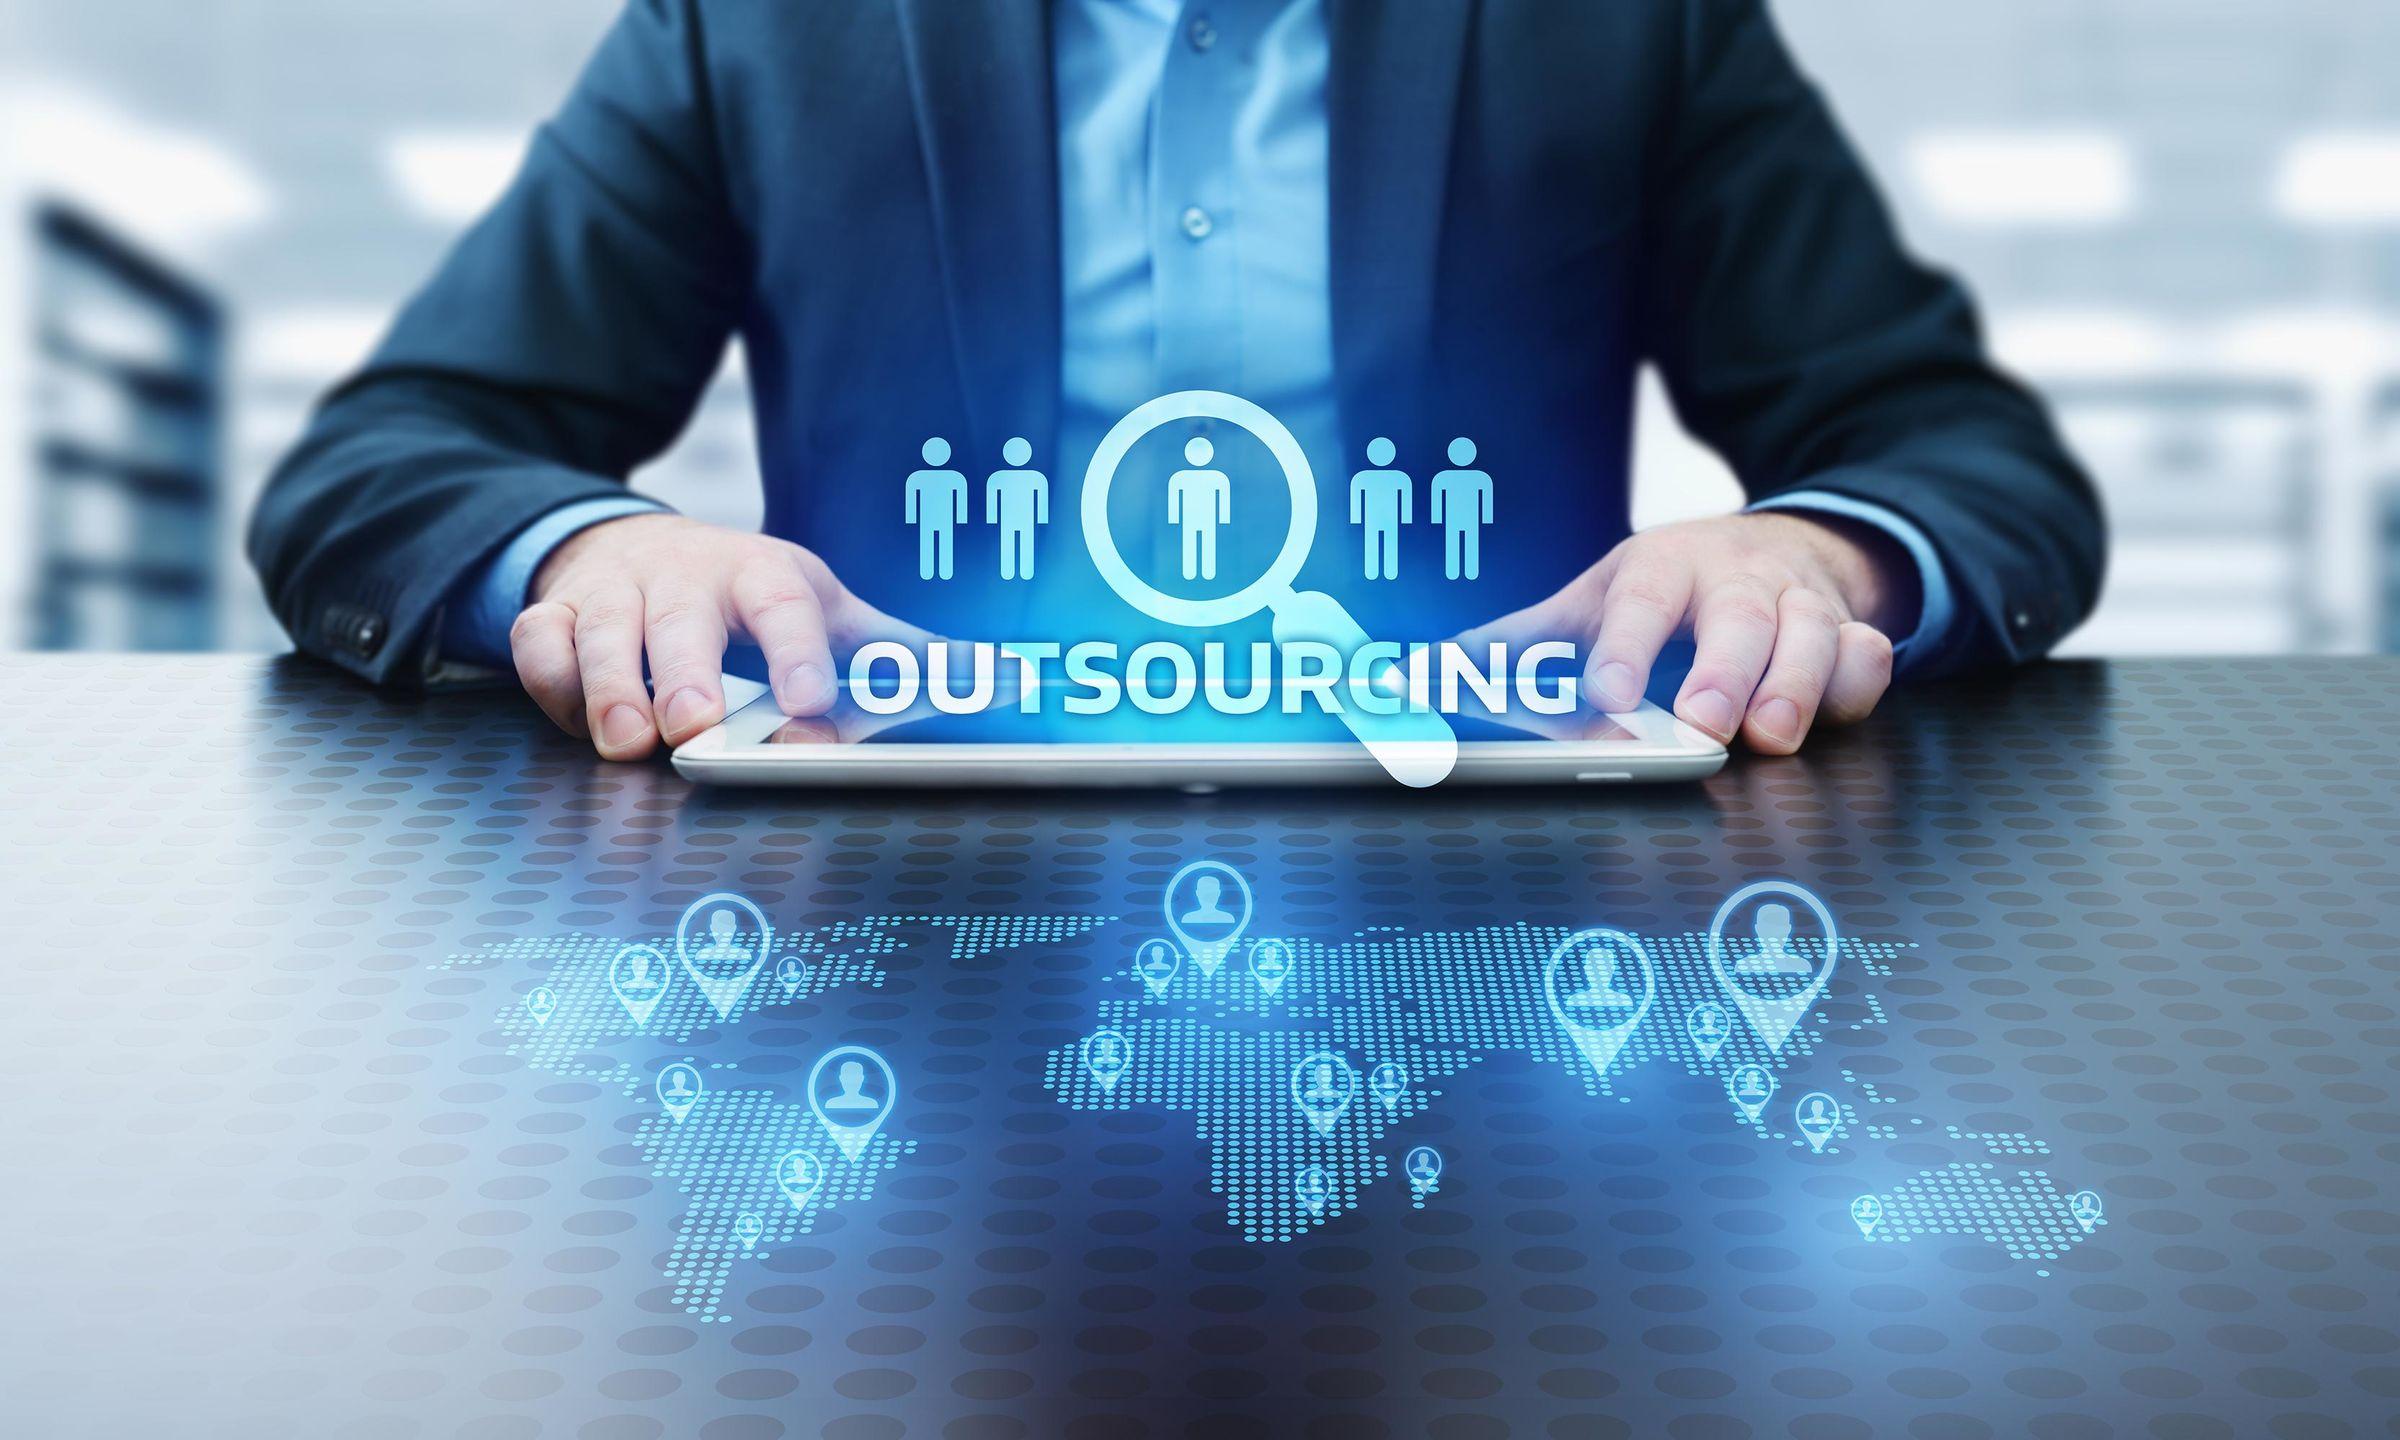 Wann sich Outsourcing lohnt - Chaindson GmbH & Co. KG.